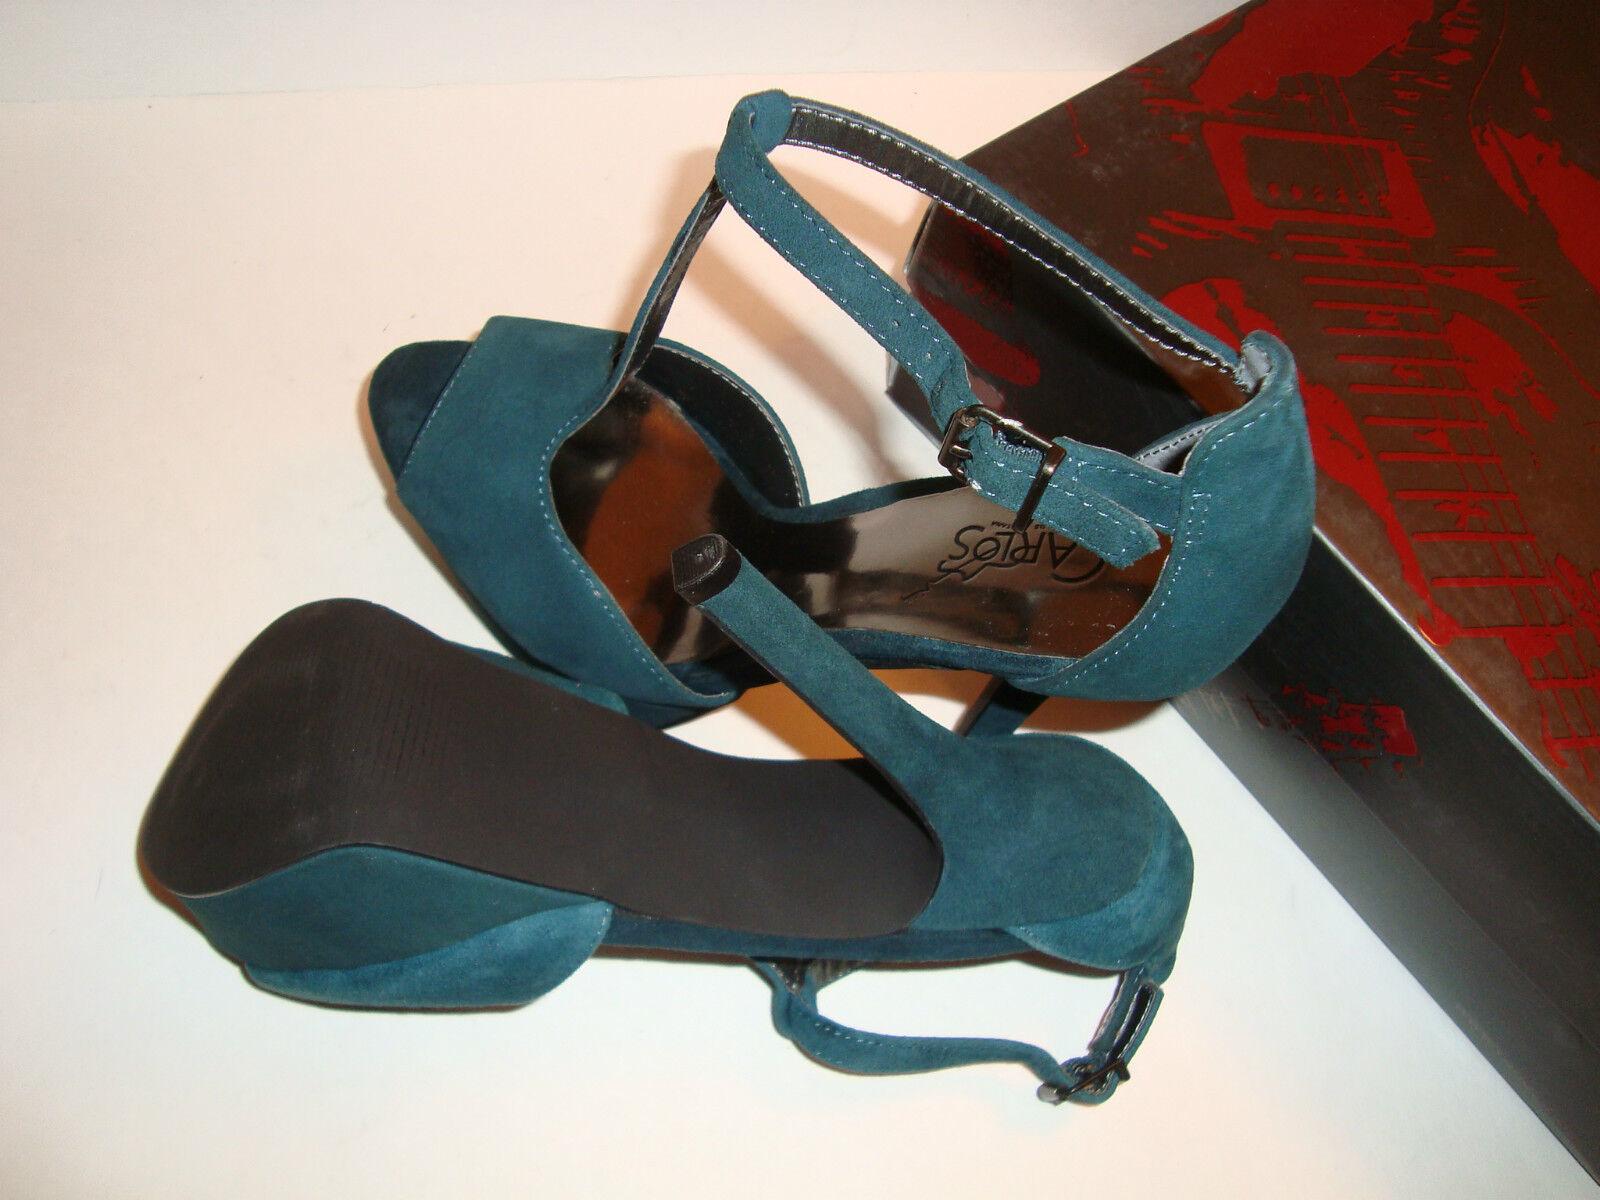 Carlos By Carlos Santana Damenschuhe NWB Sardinia Teal NEW Sandales Schuhes 7 MED NEW Teal 674d7c